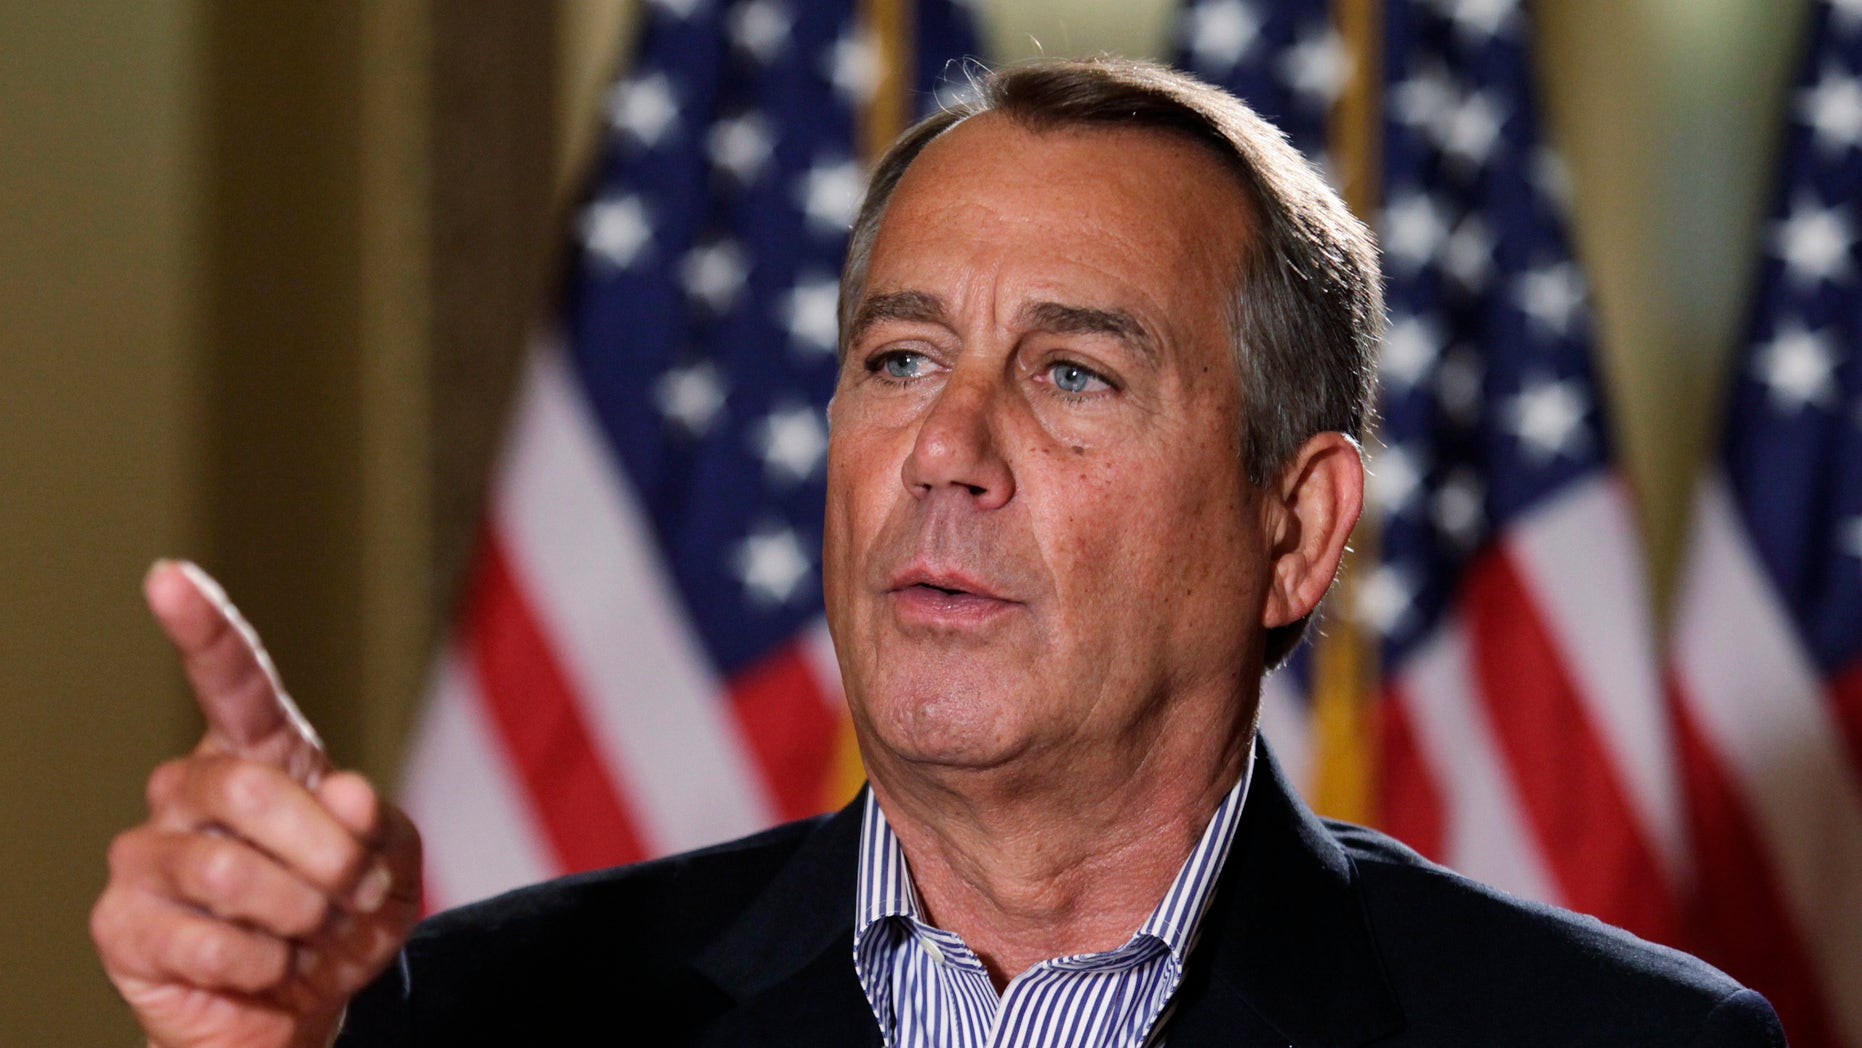 Dec. 7, 2012: U.S. House Speaker John Boehner (R-OH) speaks to the media outside his office on Capitol Hill in Washington.